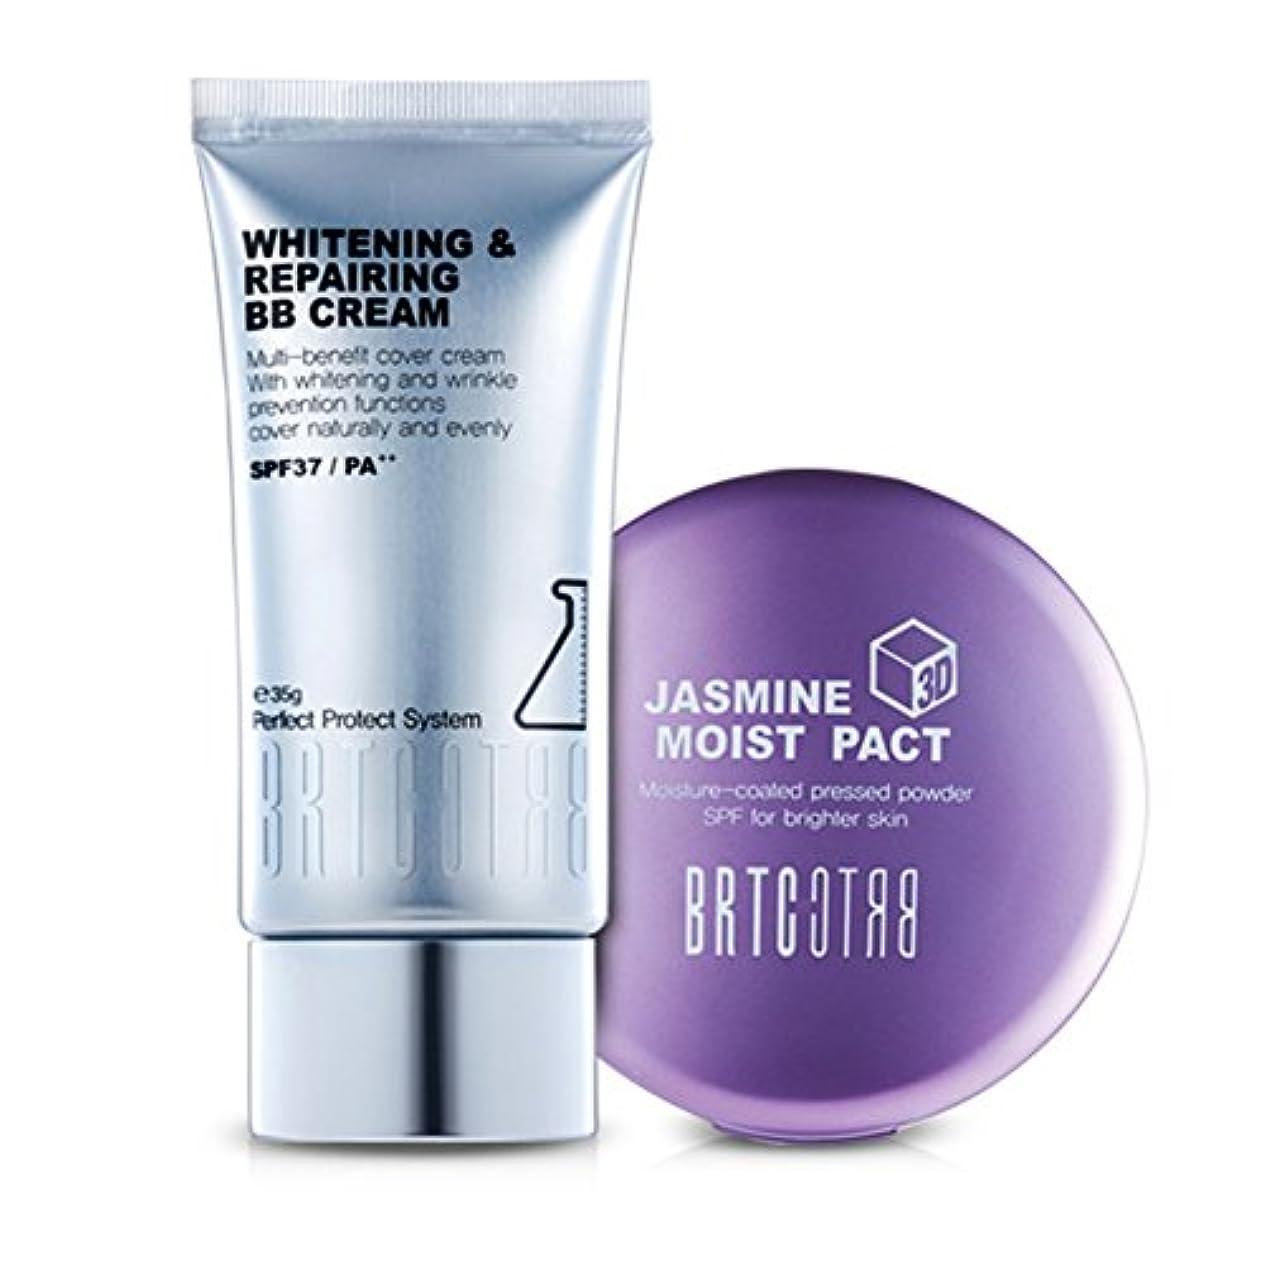 【BRTC/非アルティ時】Whitening&Moisture Make Up Setホワイトニングビビ水分ファクト35g 13g[BB Cream+ Moist Pact Set](海外直送品)